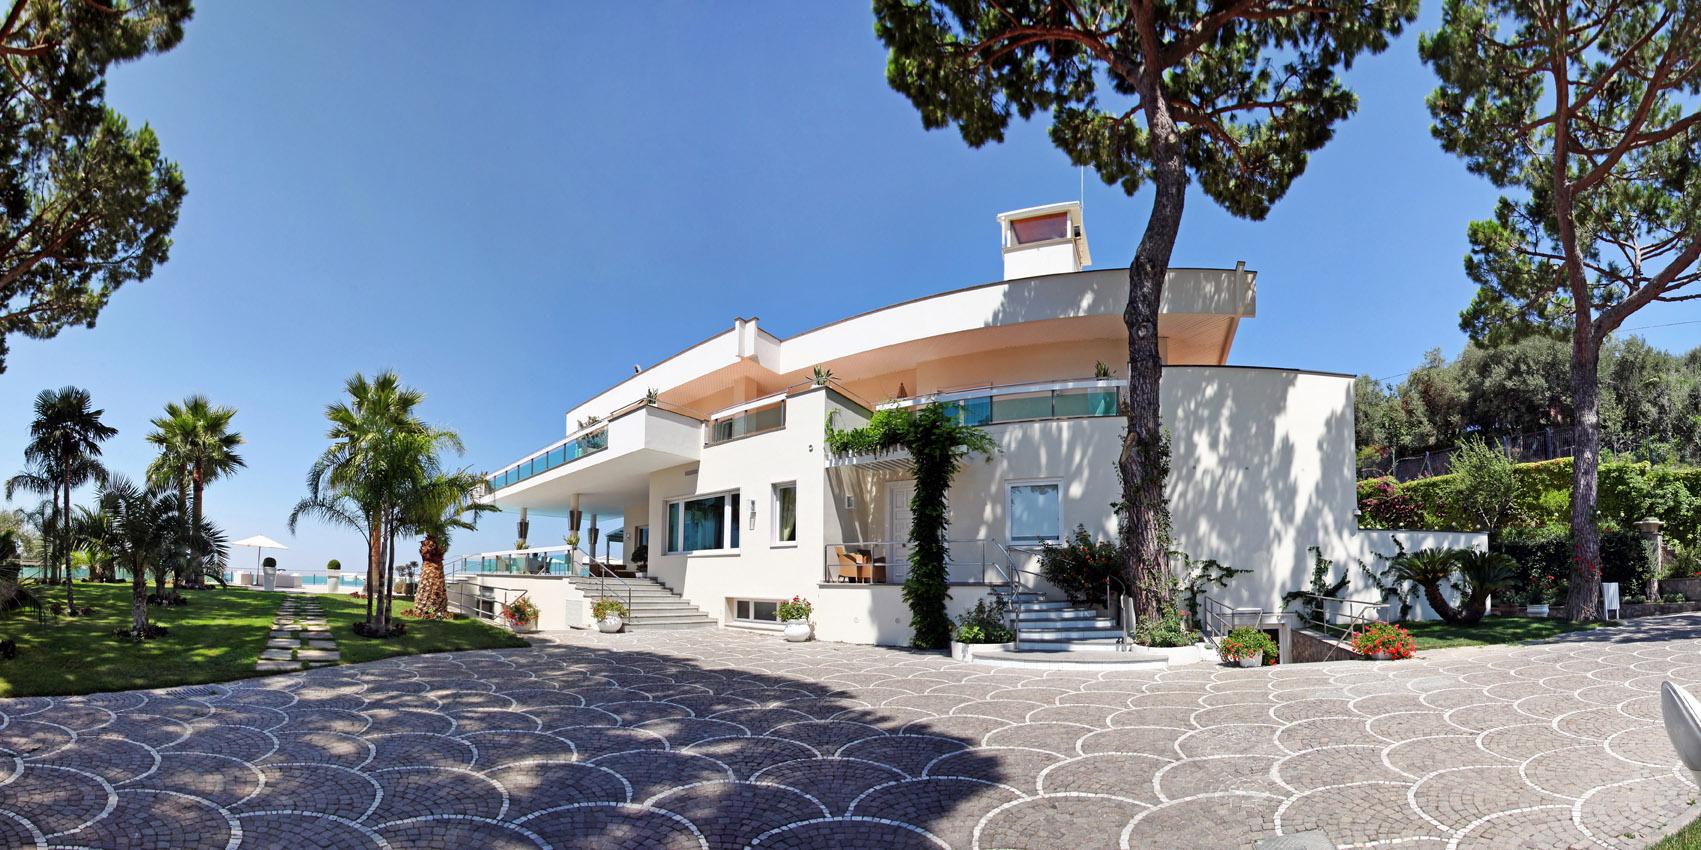 Wedding Venue In The Amalfi Coast Villa On Neapolitan Gulf